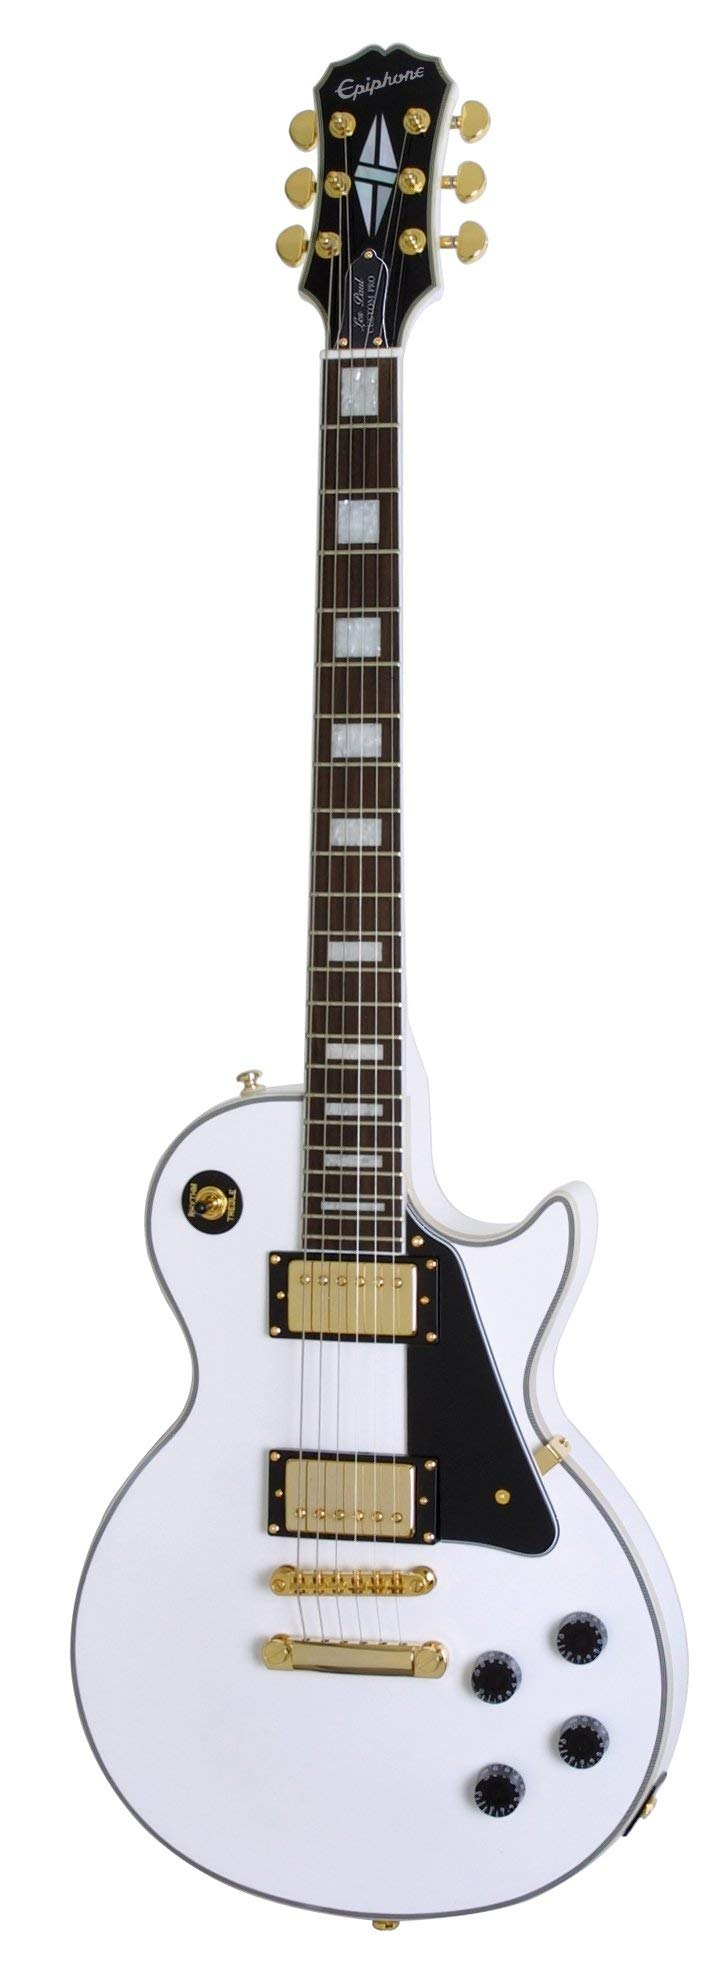 Cheap Les Paul Custom Pro Electric Guitar Alpine White Black Friday & Cyber Monday 2019